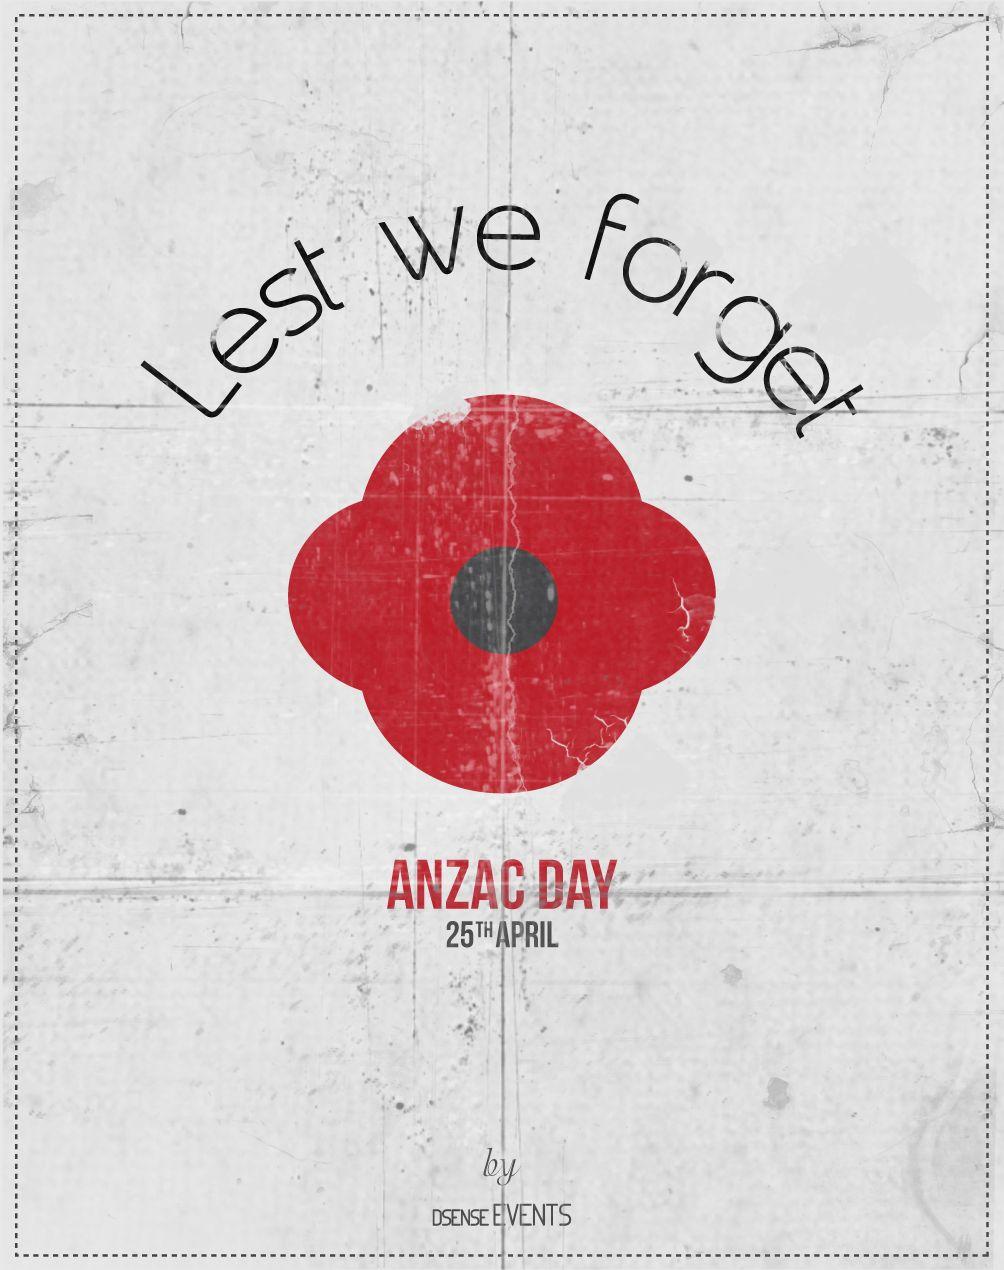 ANZAC DAY Anzac day, Anzac day quotes, Anzac day australia